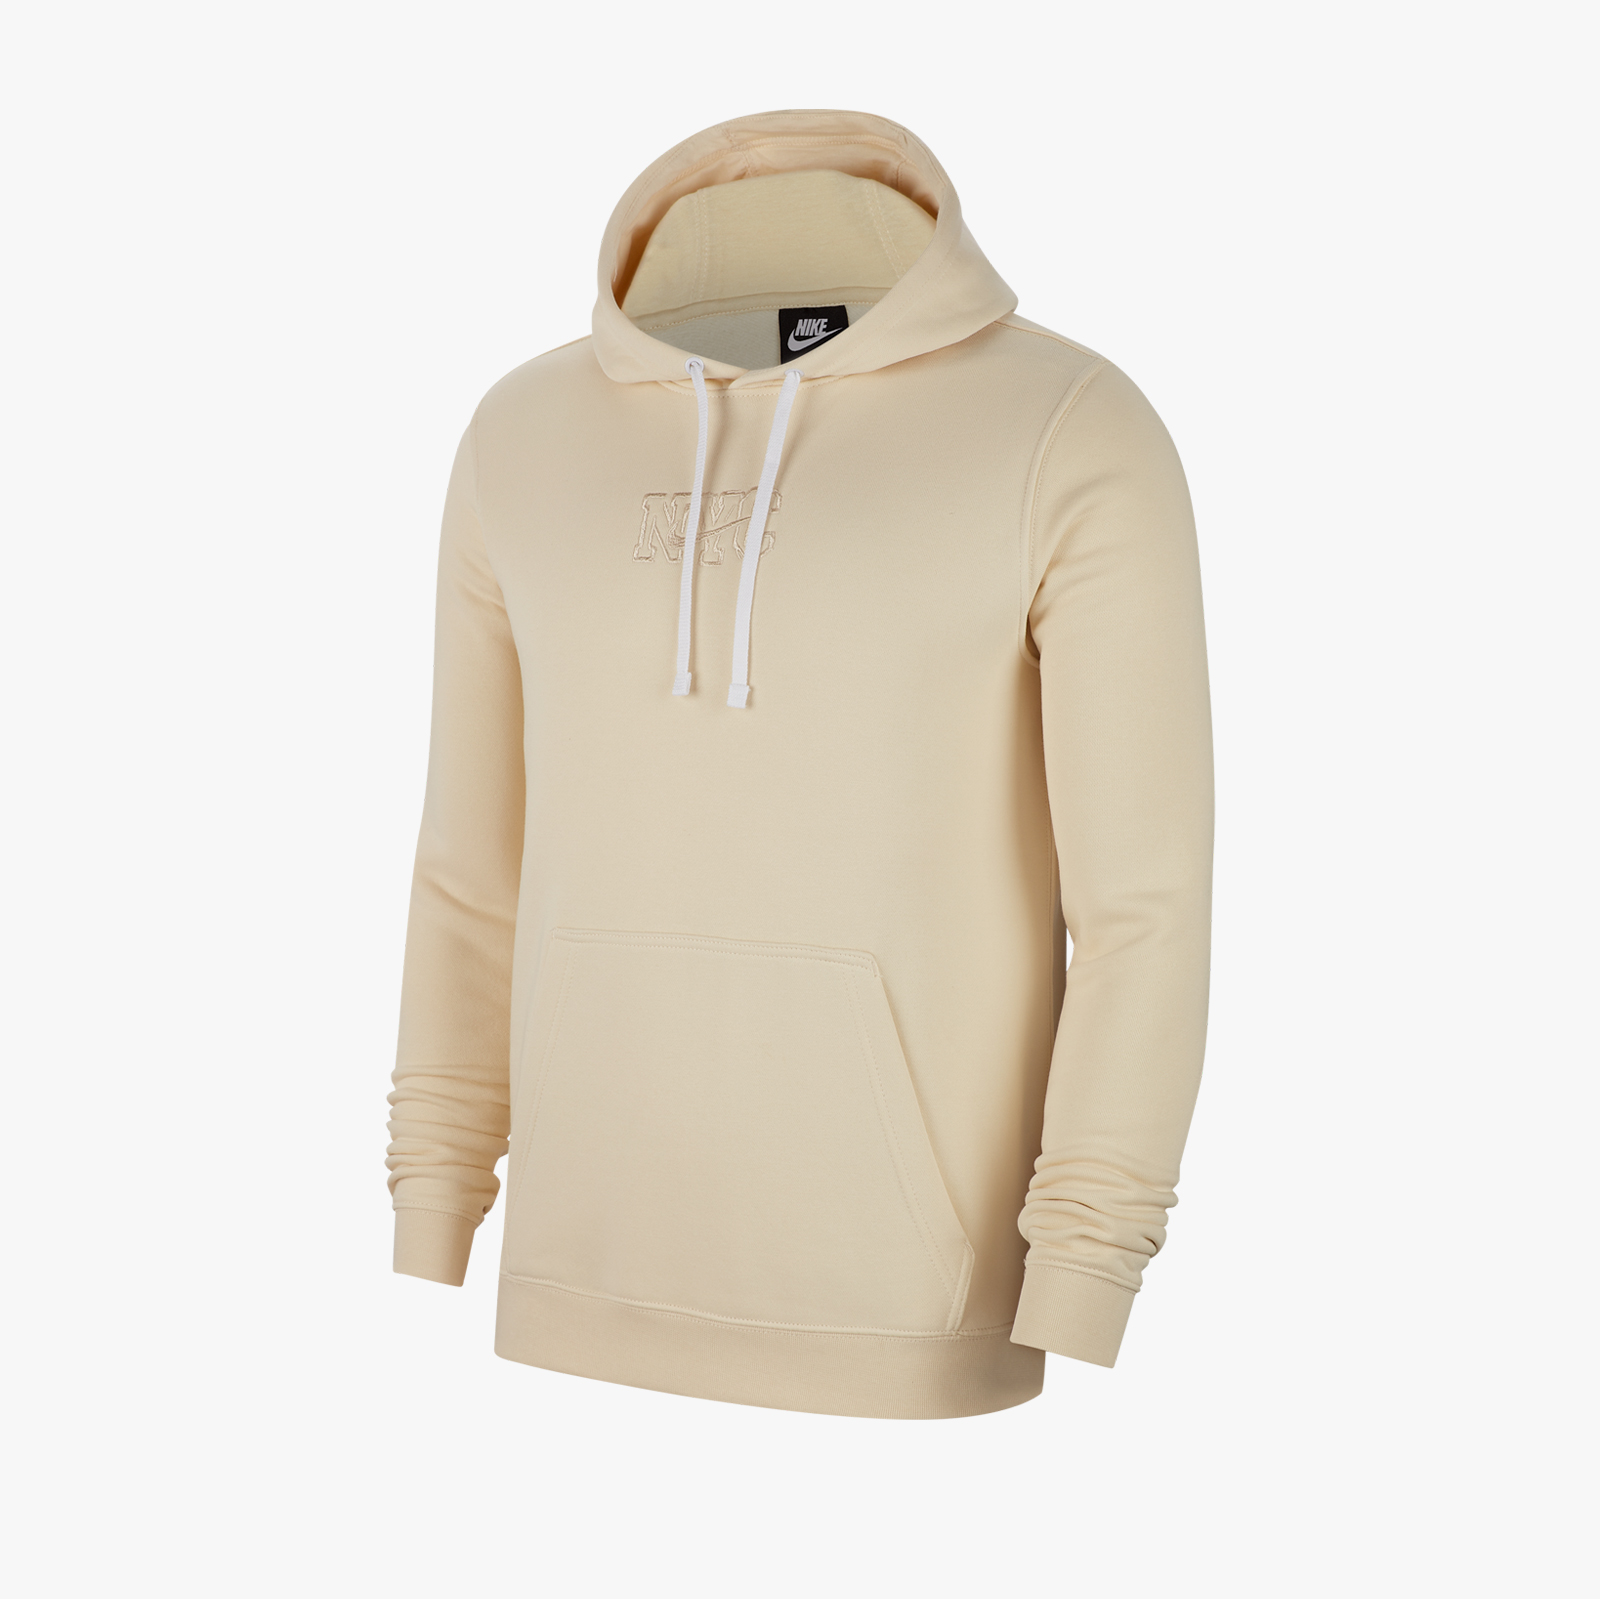 new style e41da 8f02b Nike Sportswear NSW Club PO Hoody